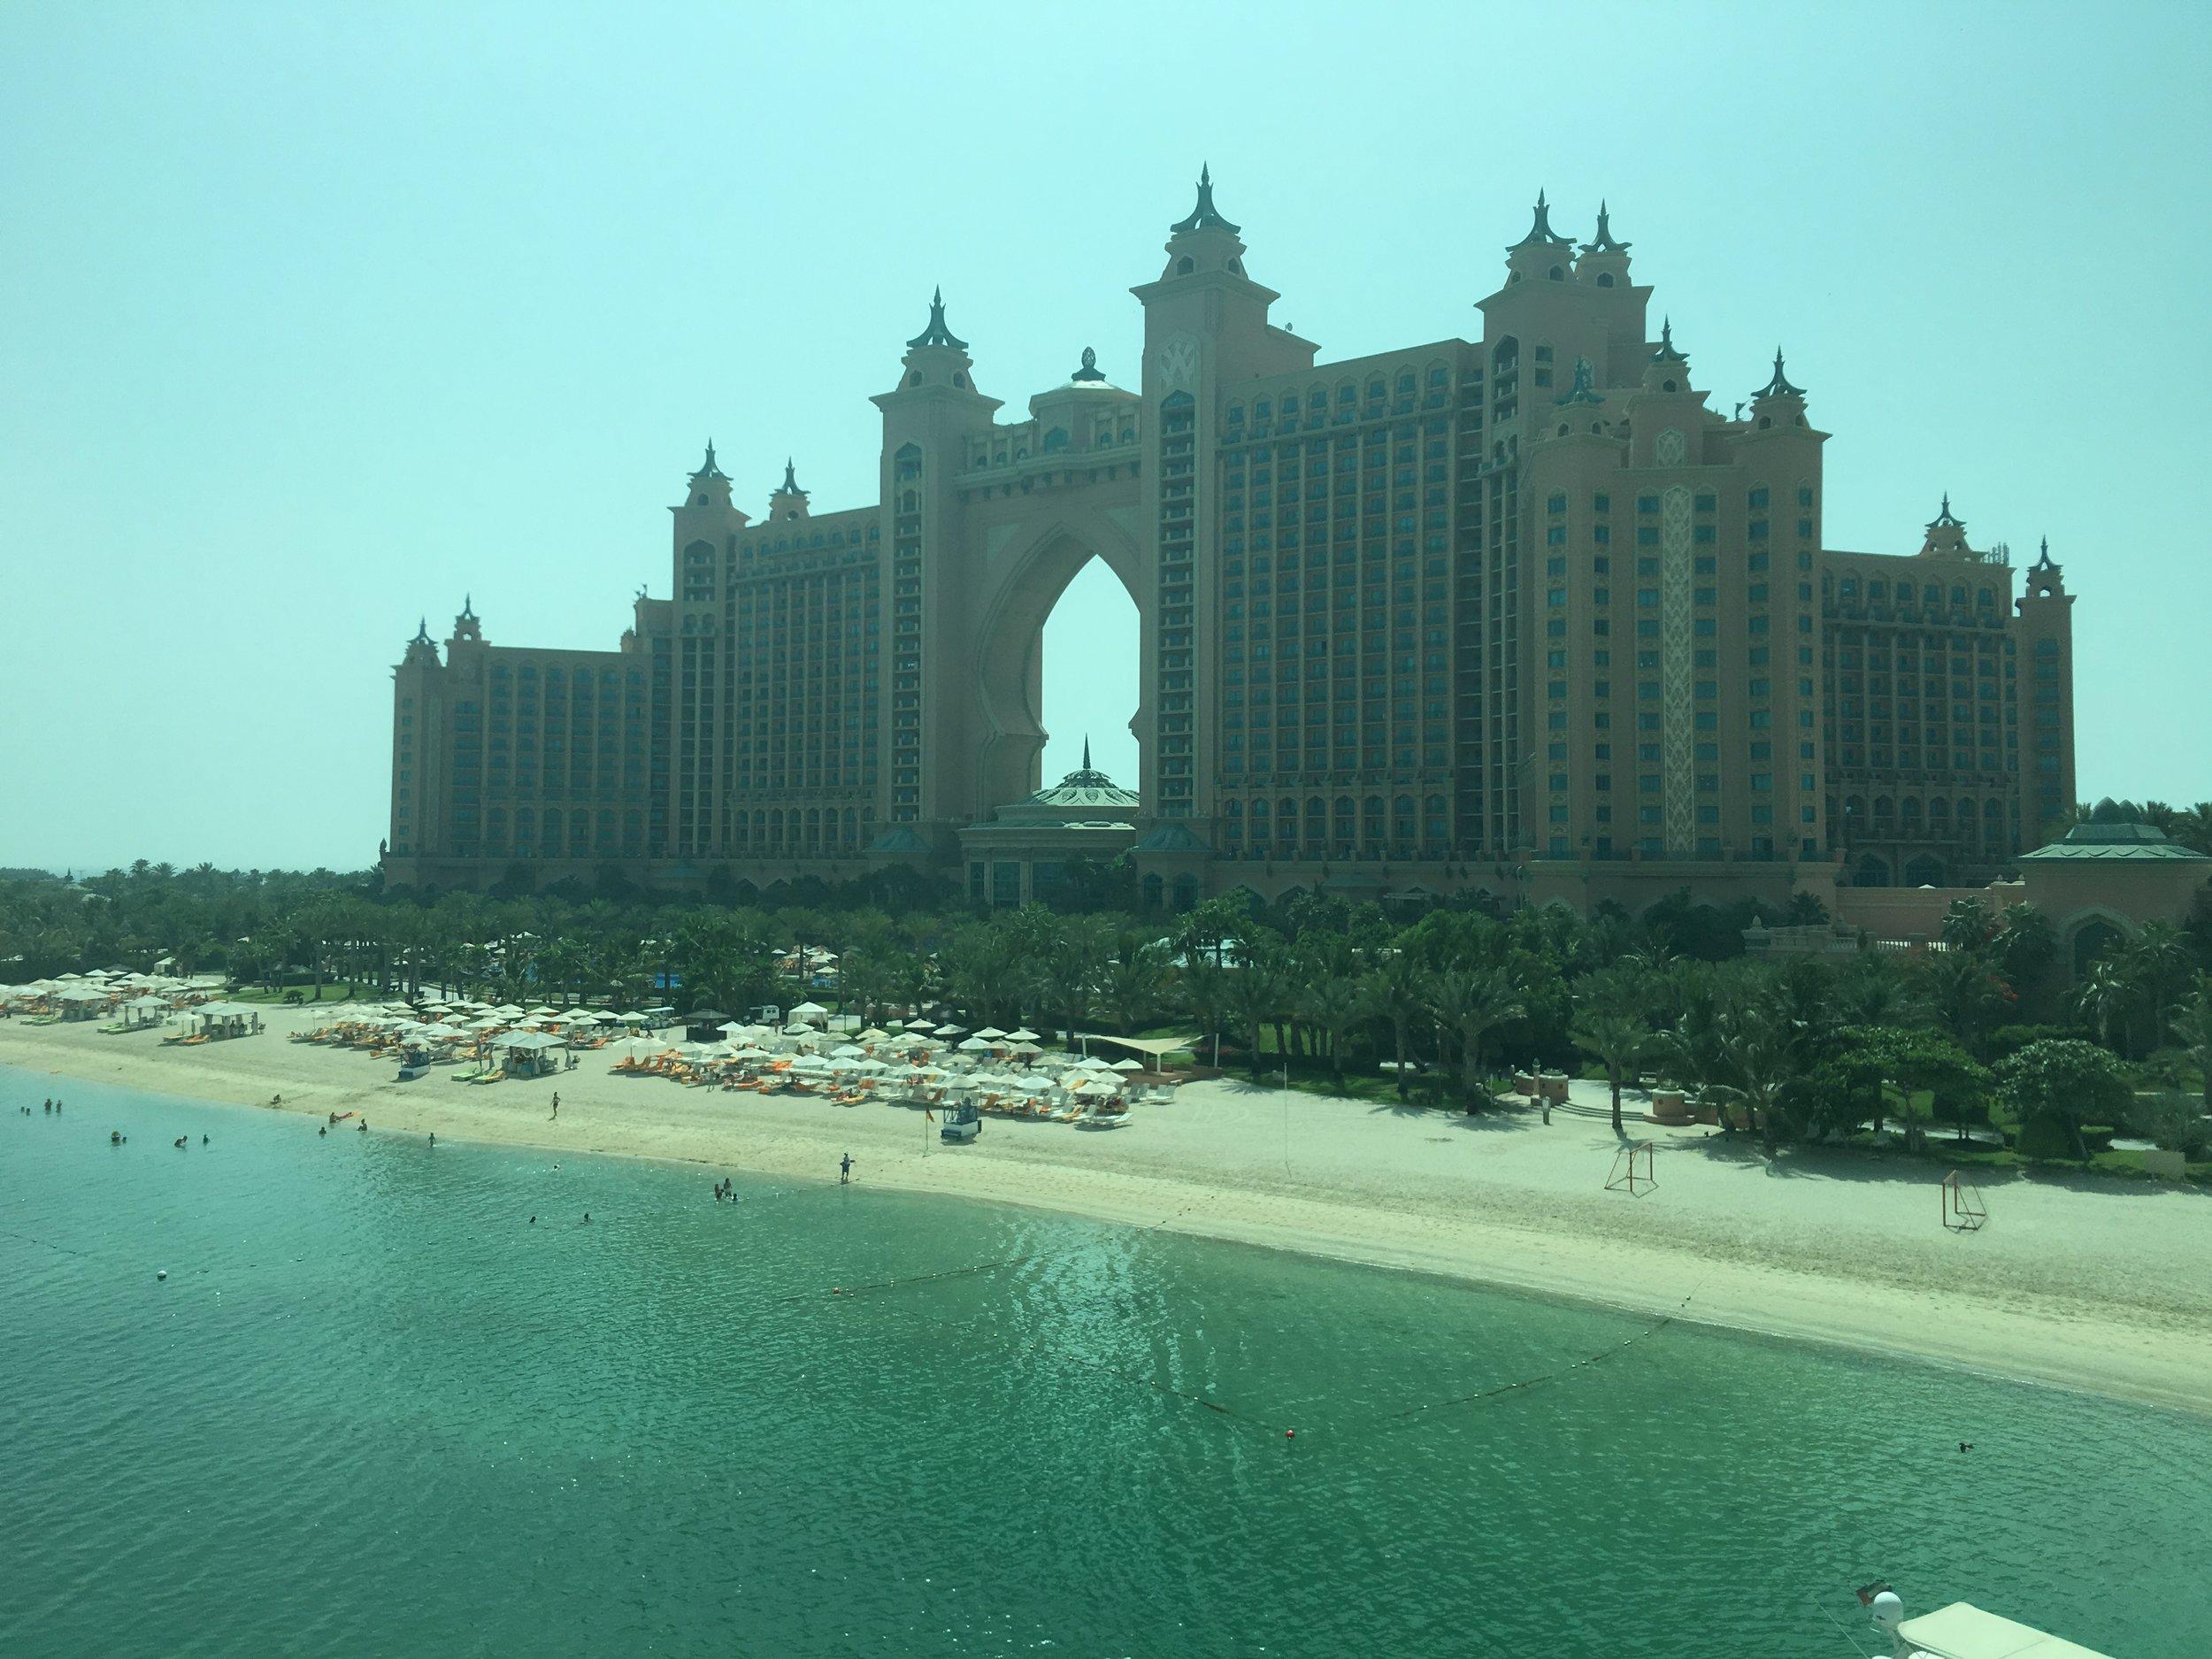 Atlantis, The Palm set on the iconic Palm Jumeirah island, Dubai.